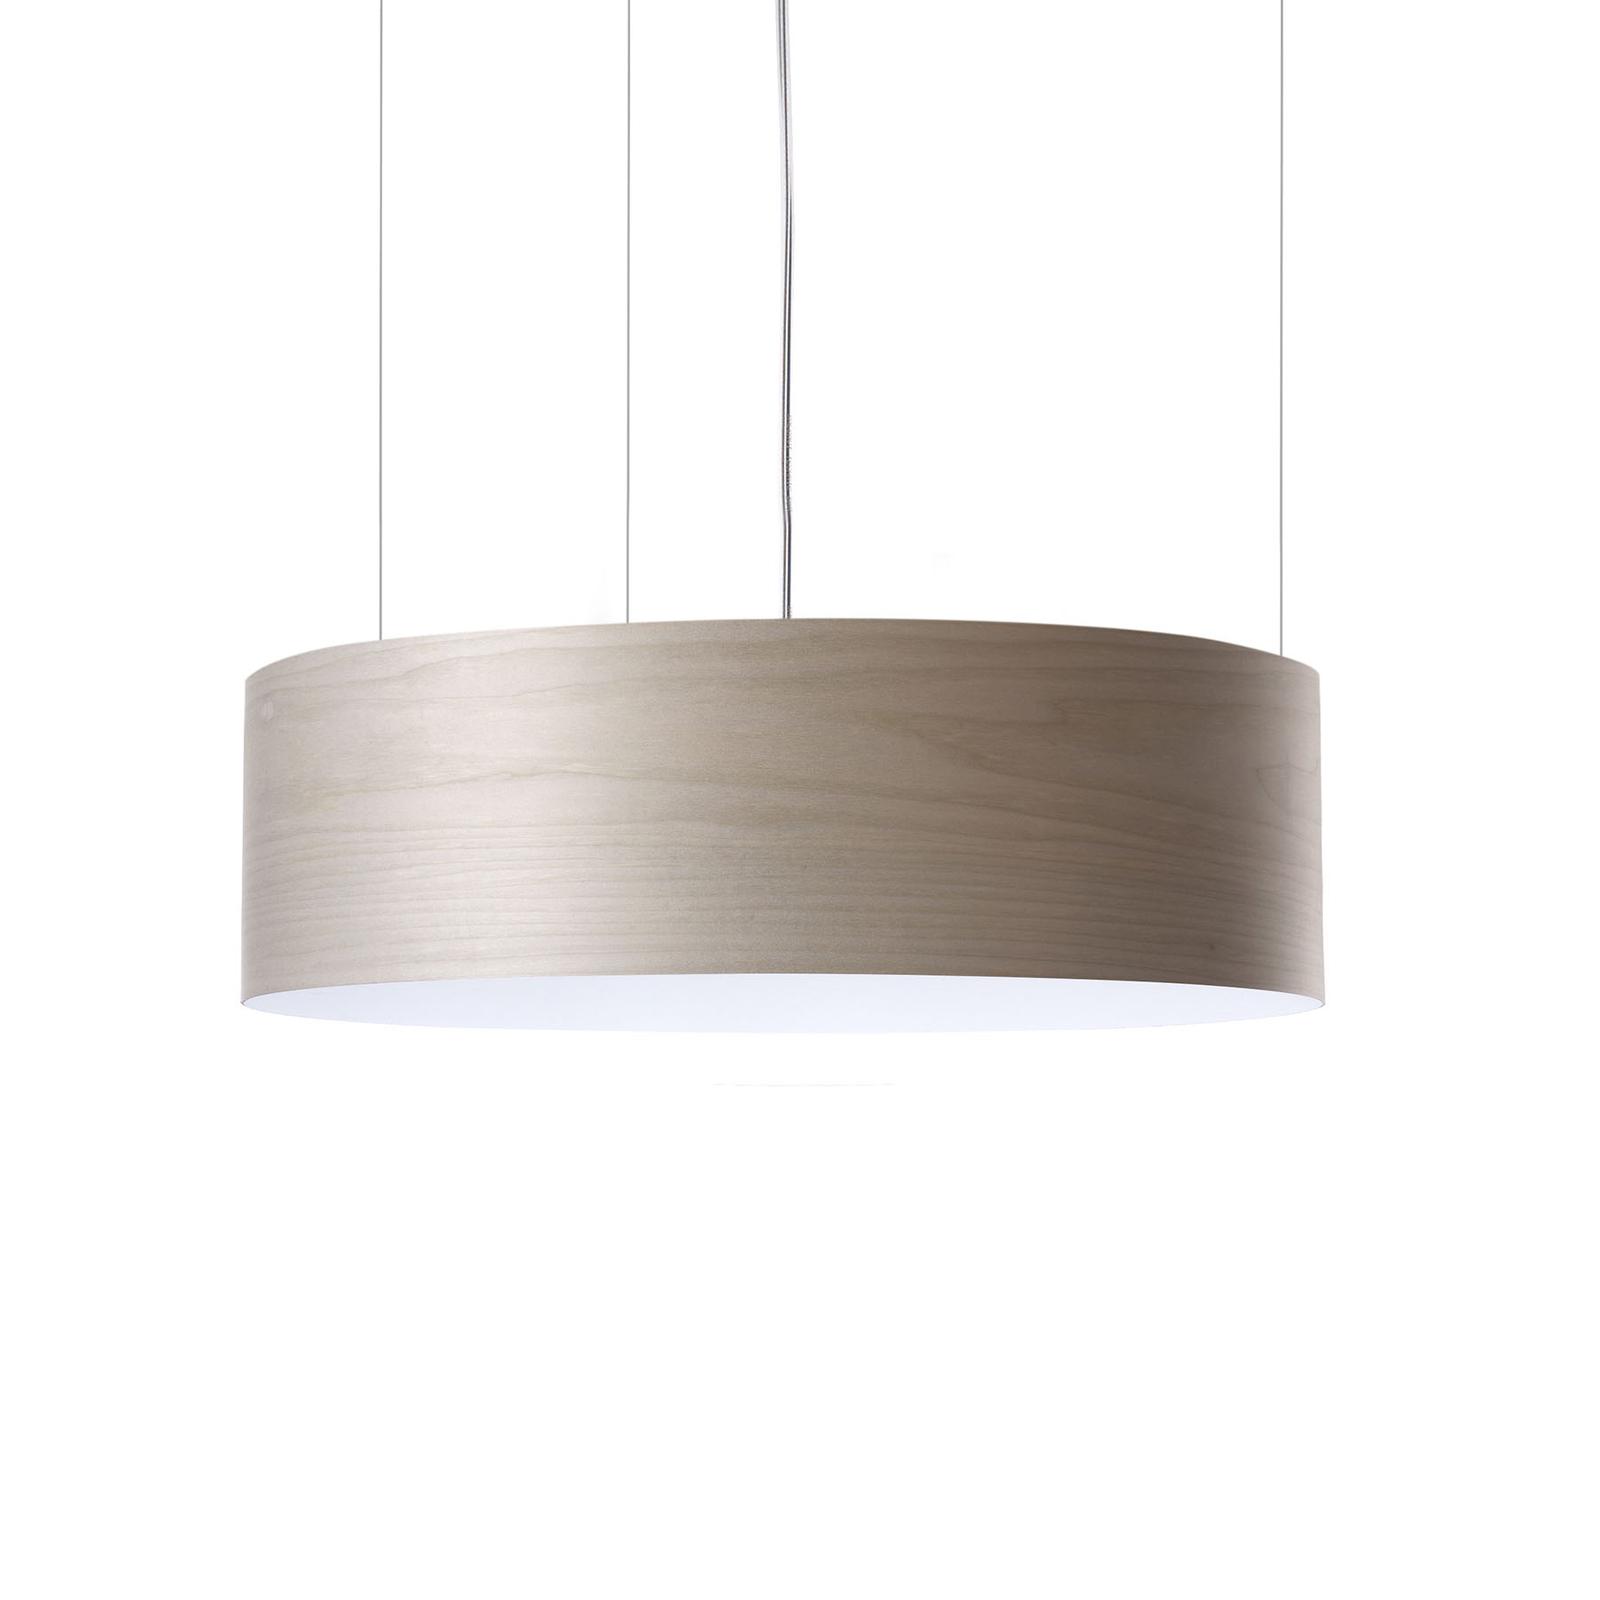 LZF Gea Slim -LED-riippuvalo, Casambi dim, harmaa